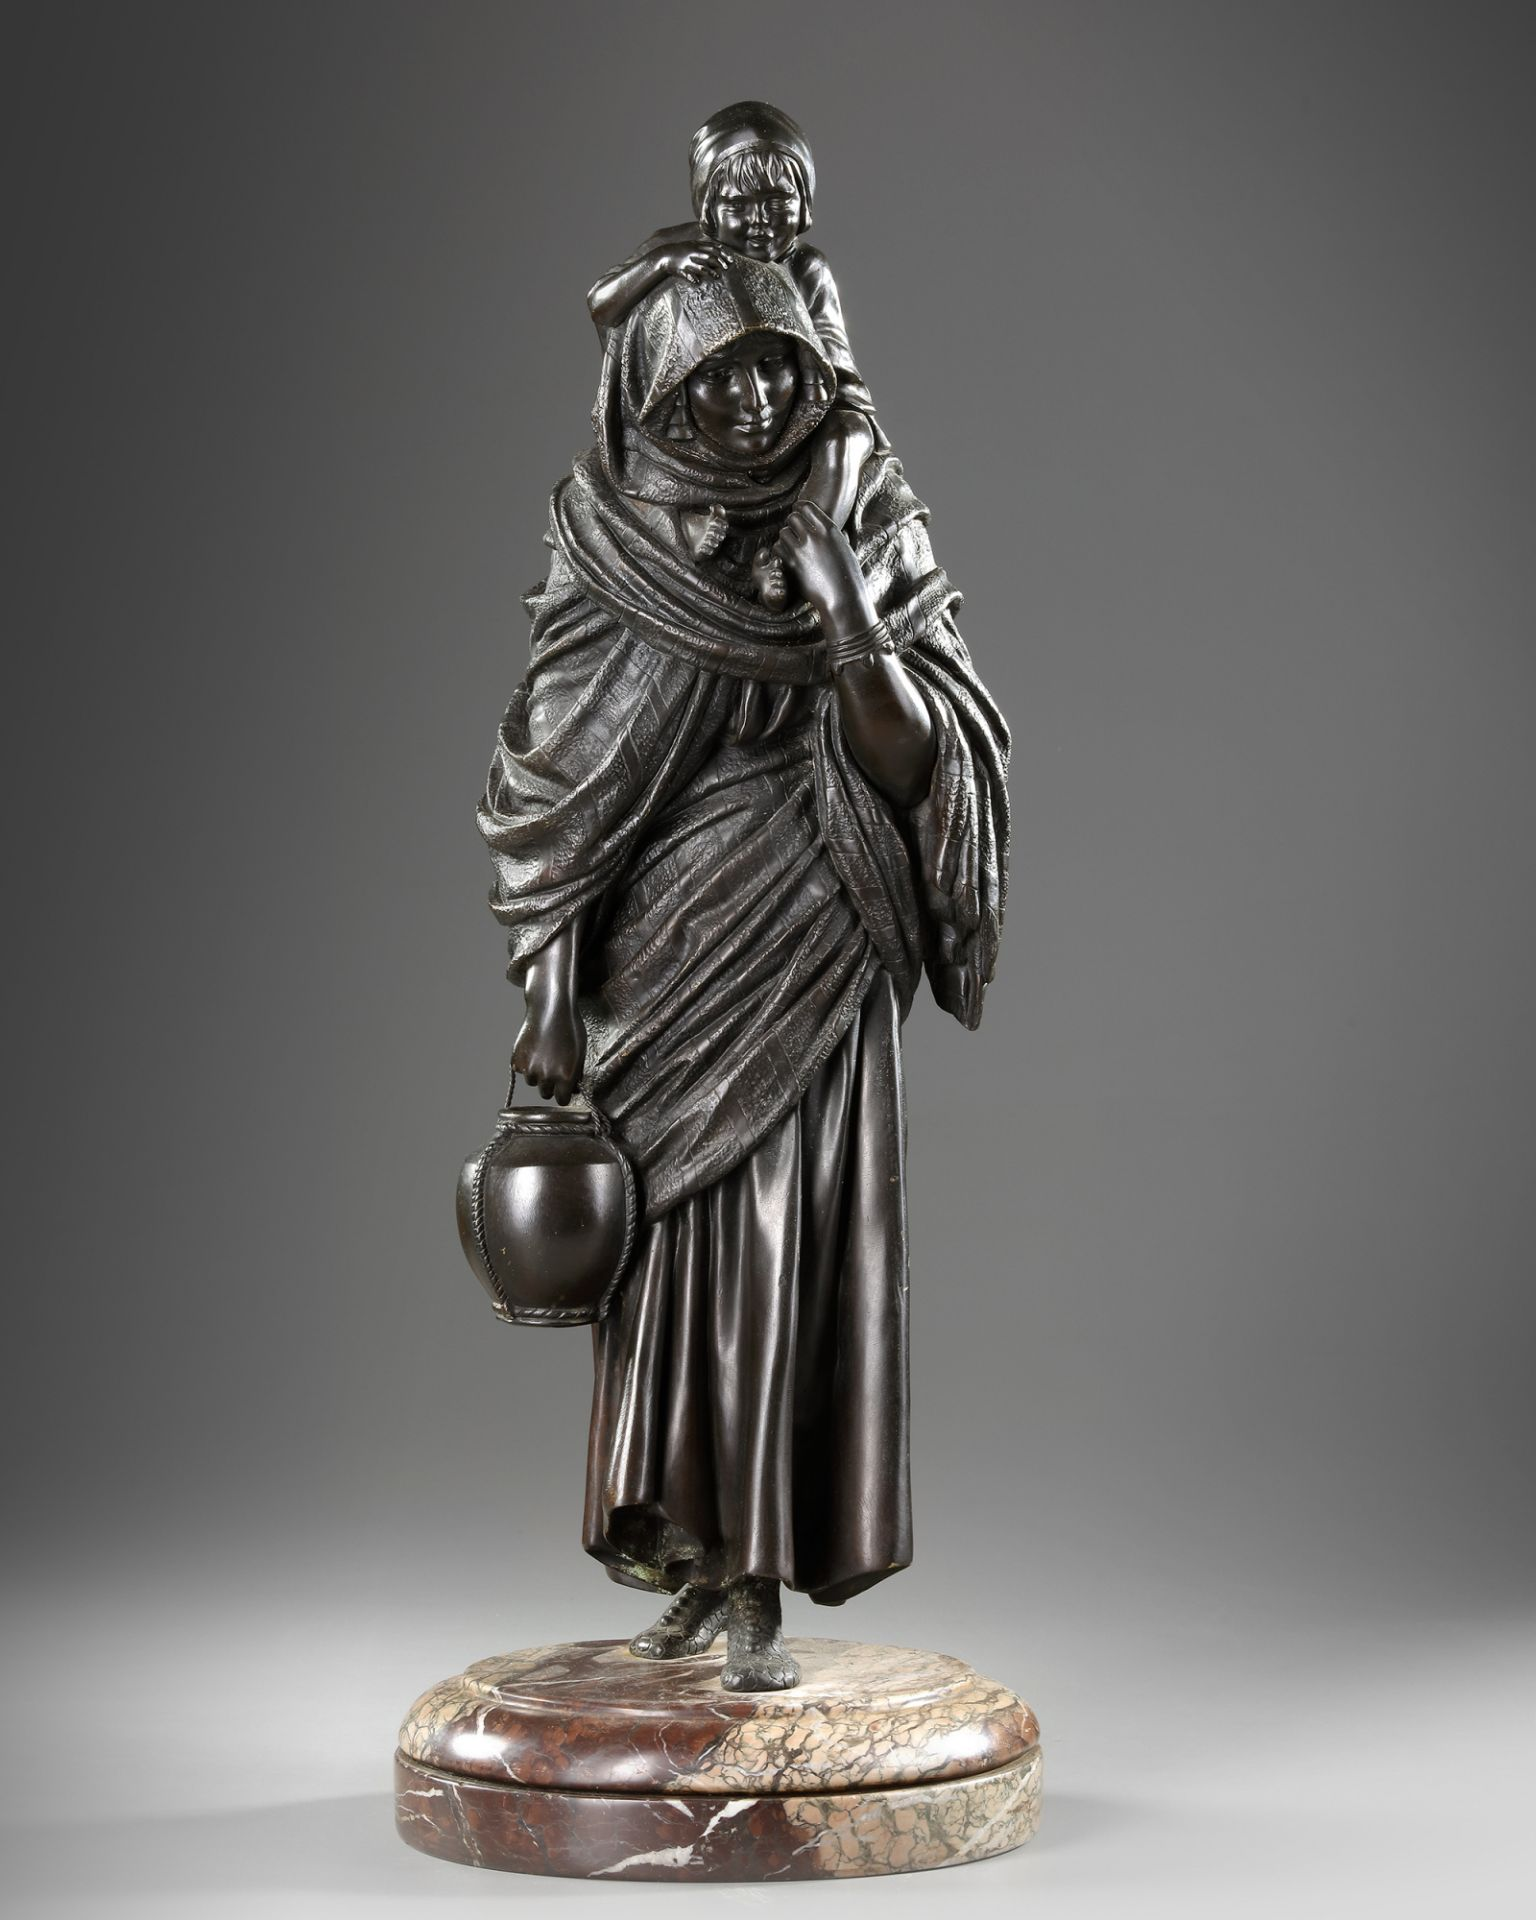 A BRONZE STATUE OF A LADY, DEMETRE CHIPARUS, 20TH CENTURY